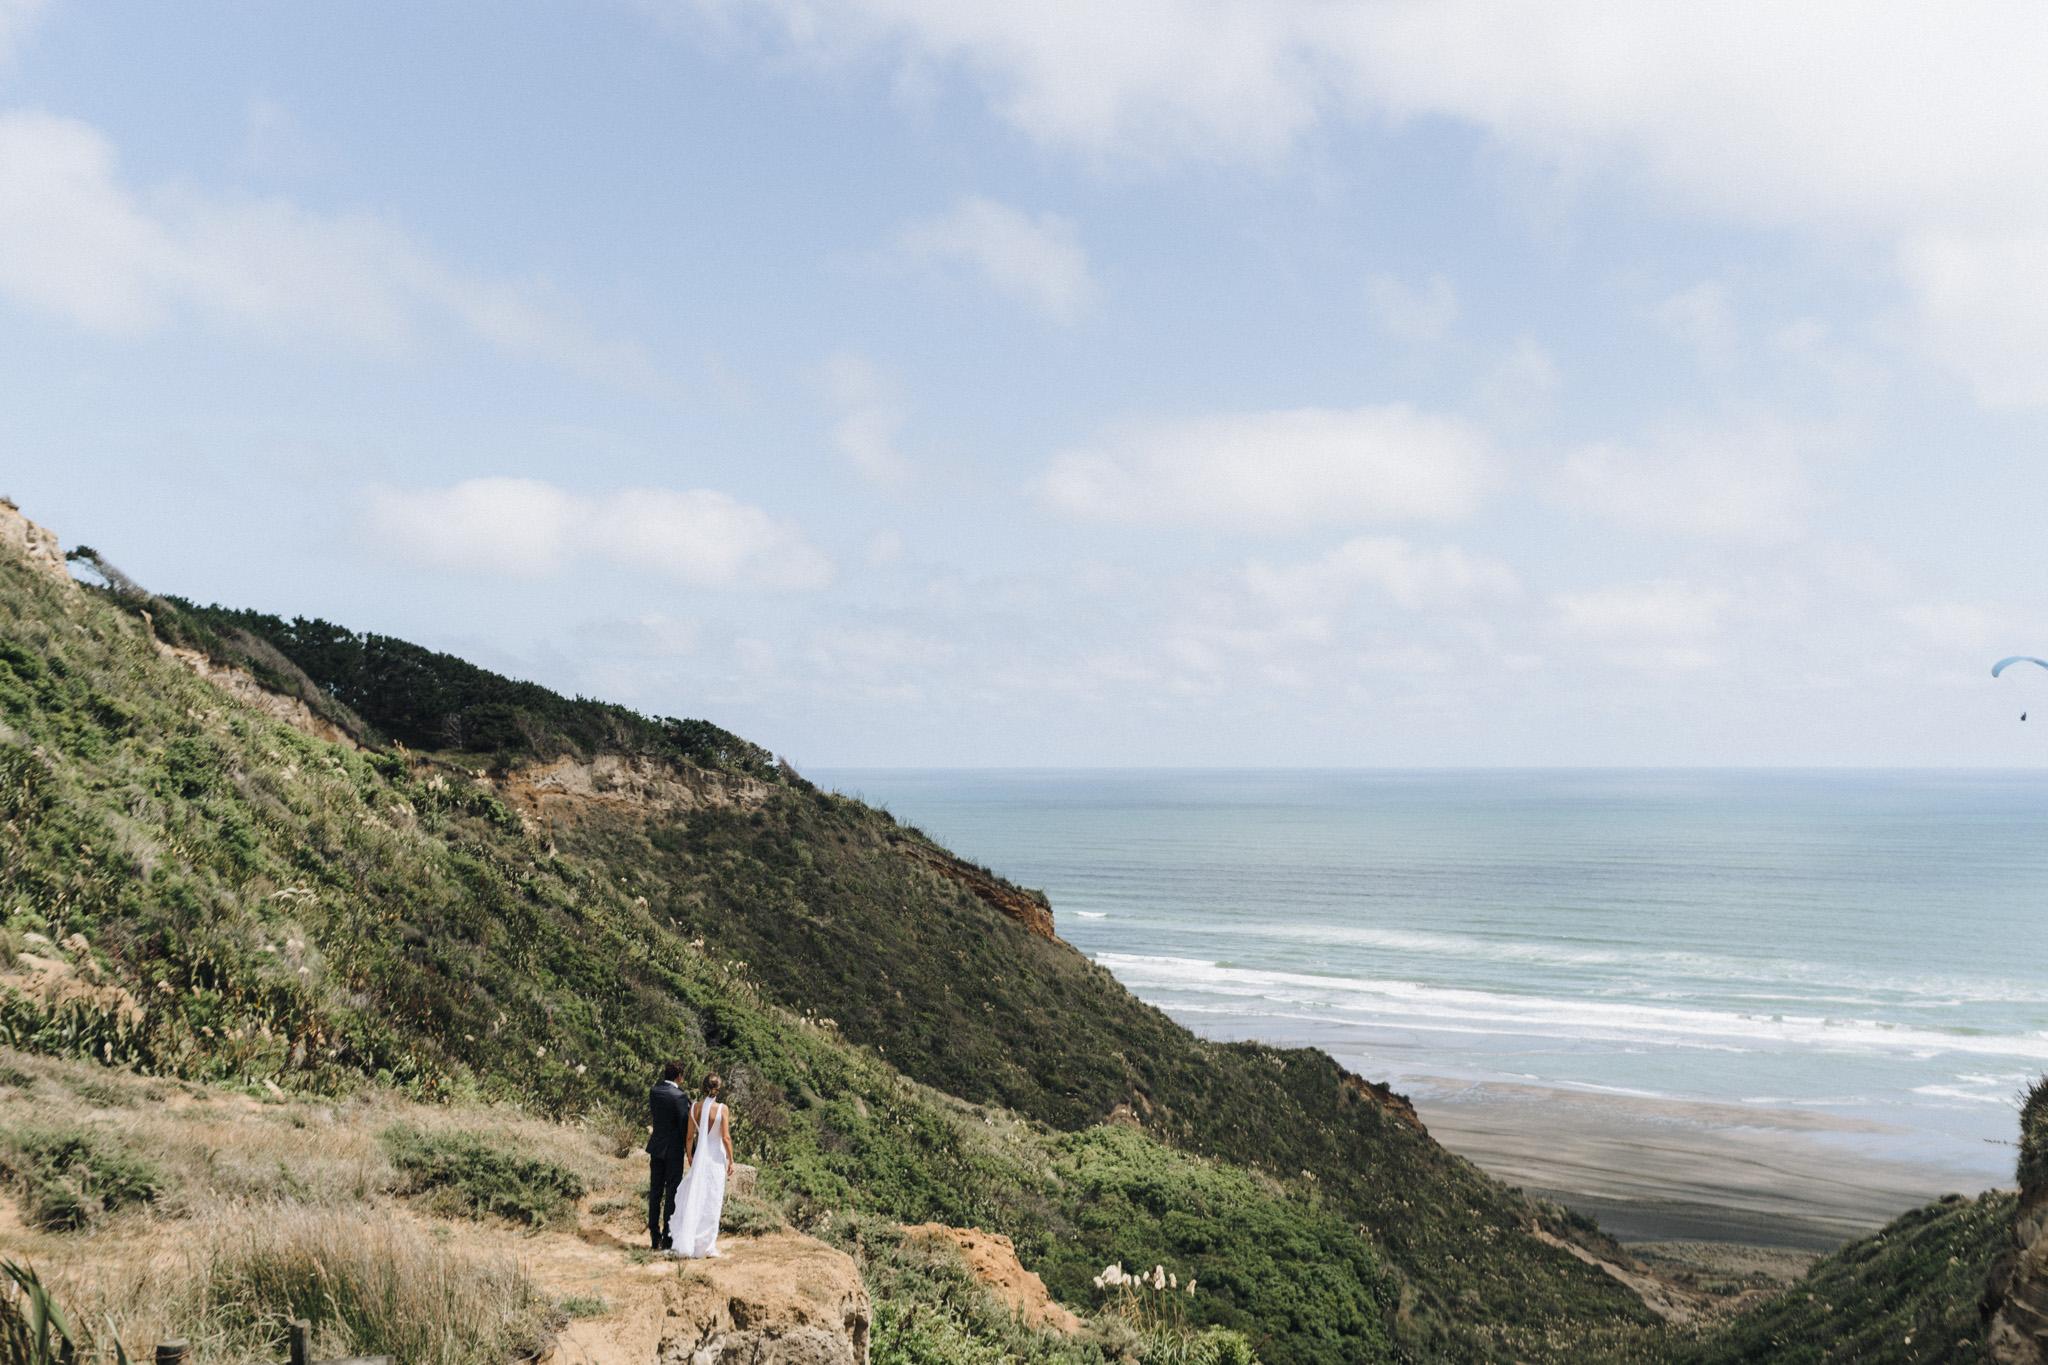 newfound-h-m-castaways-waiuku-auckland-wedding-photographer-71